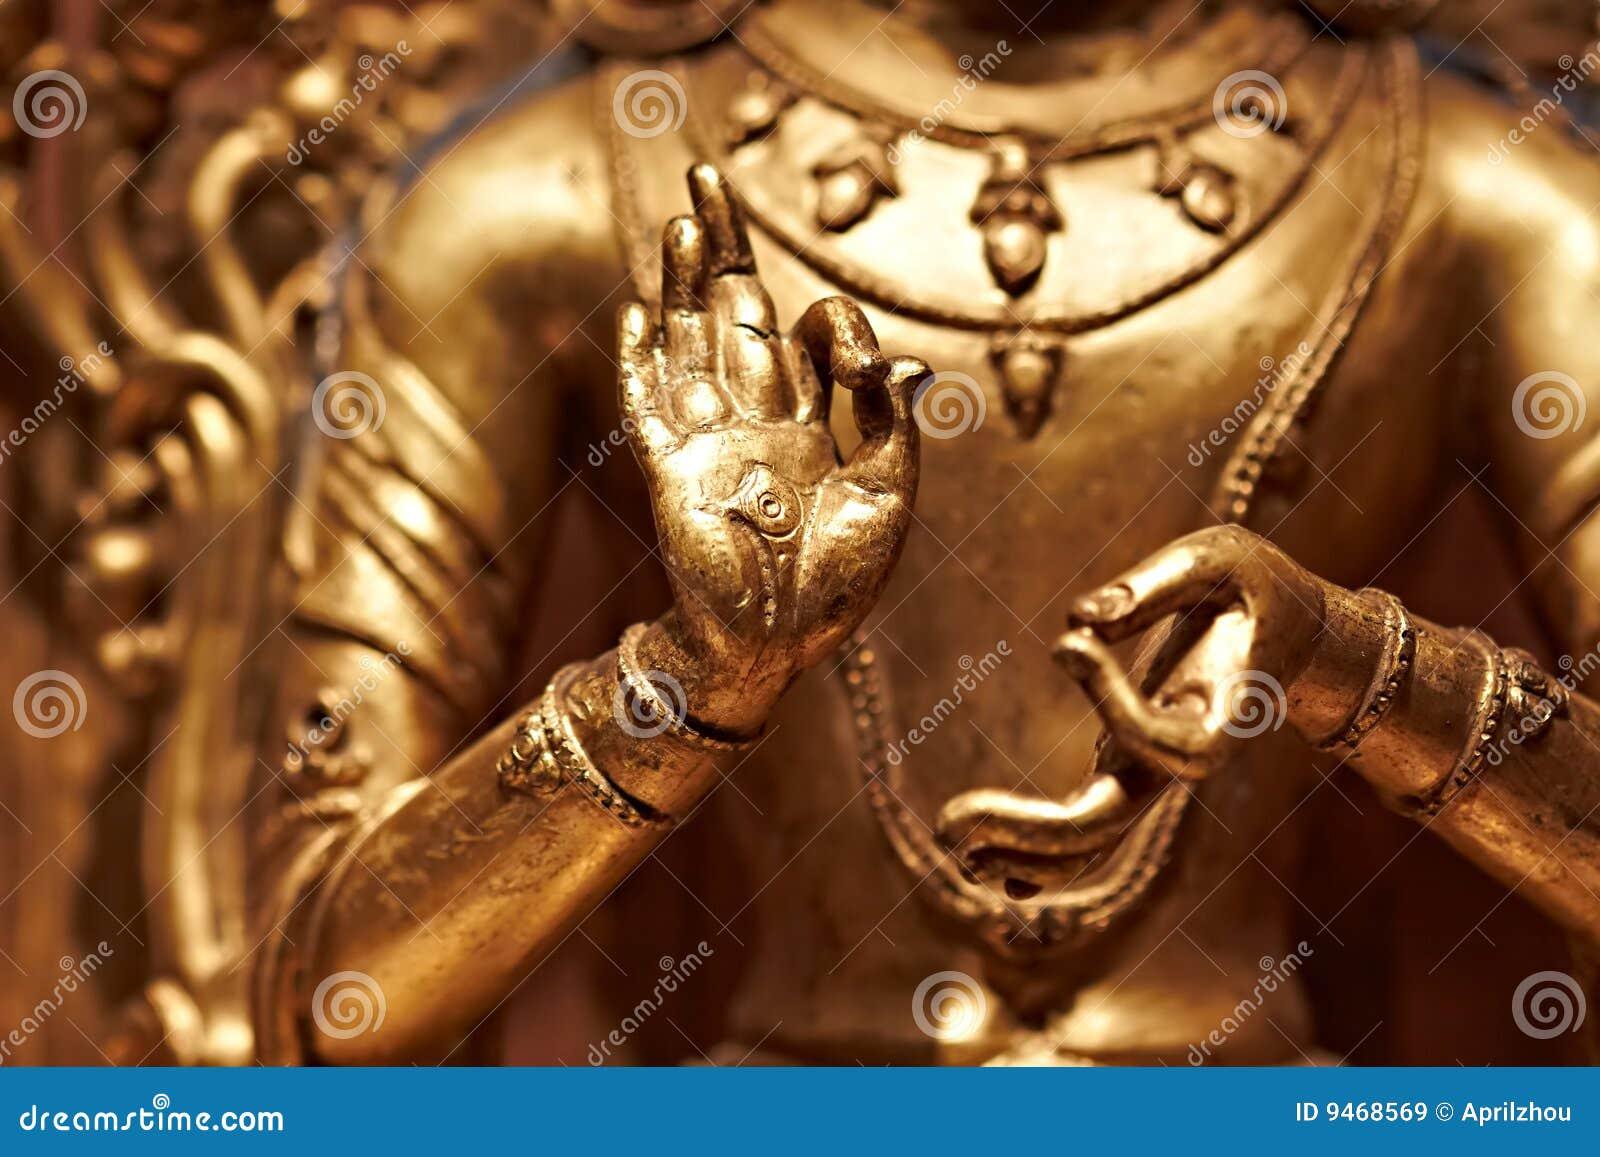 buddha hand stock image image of buddah hand contact. Black Bedroom Furniture Sets. Home Design Ideas